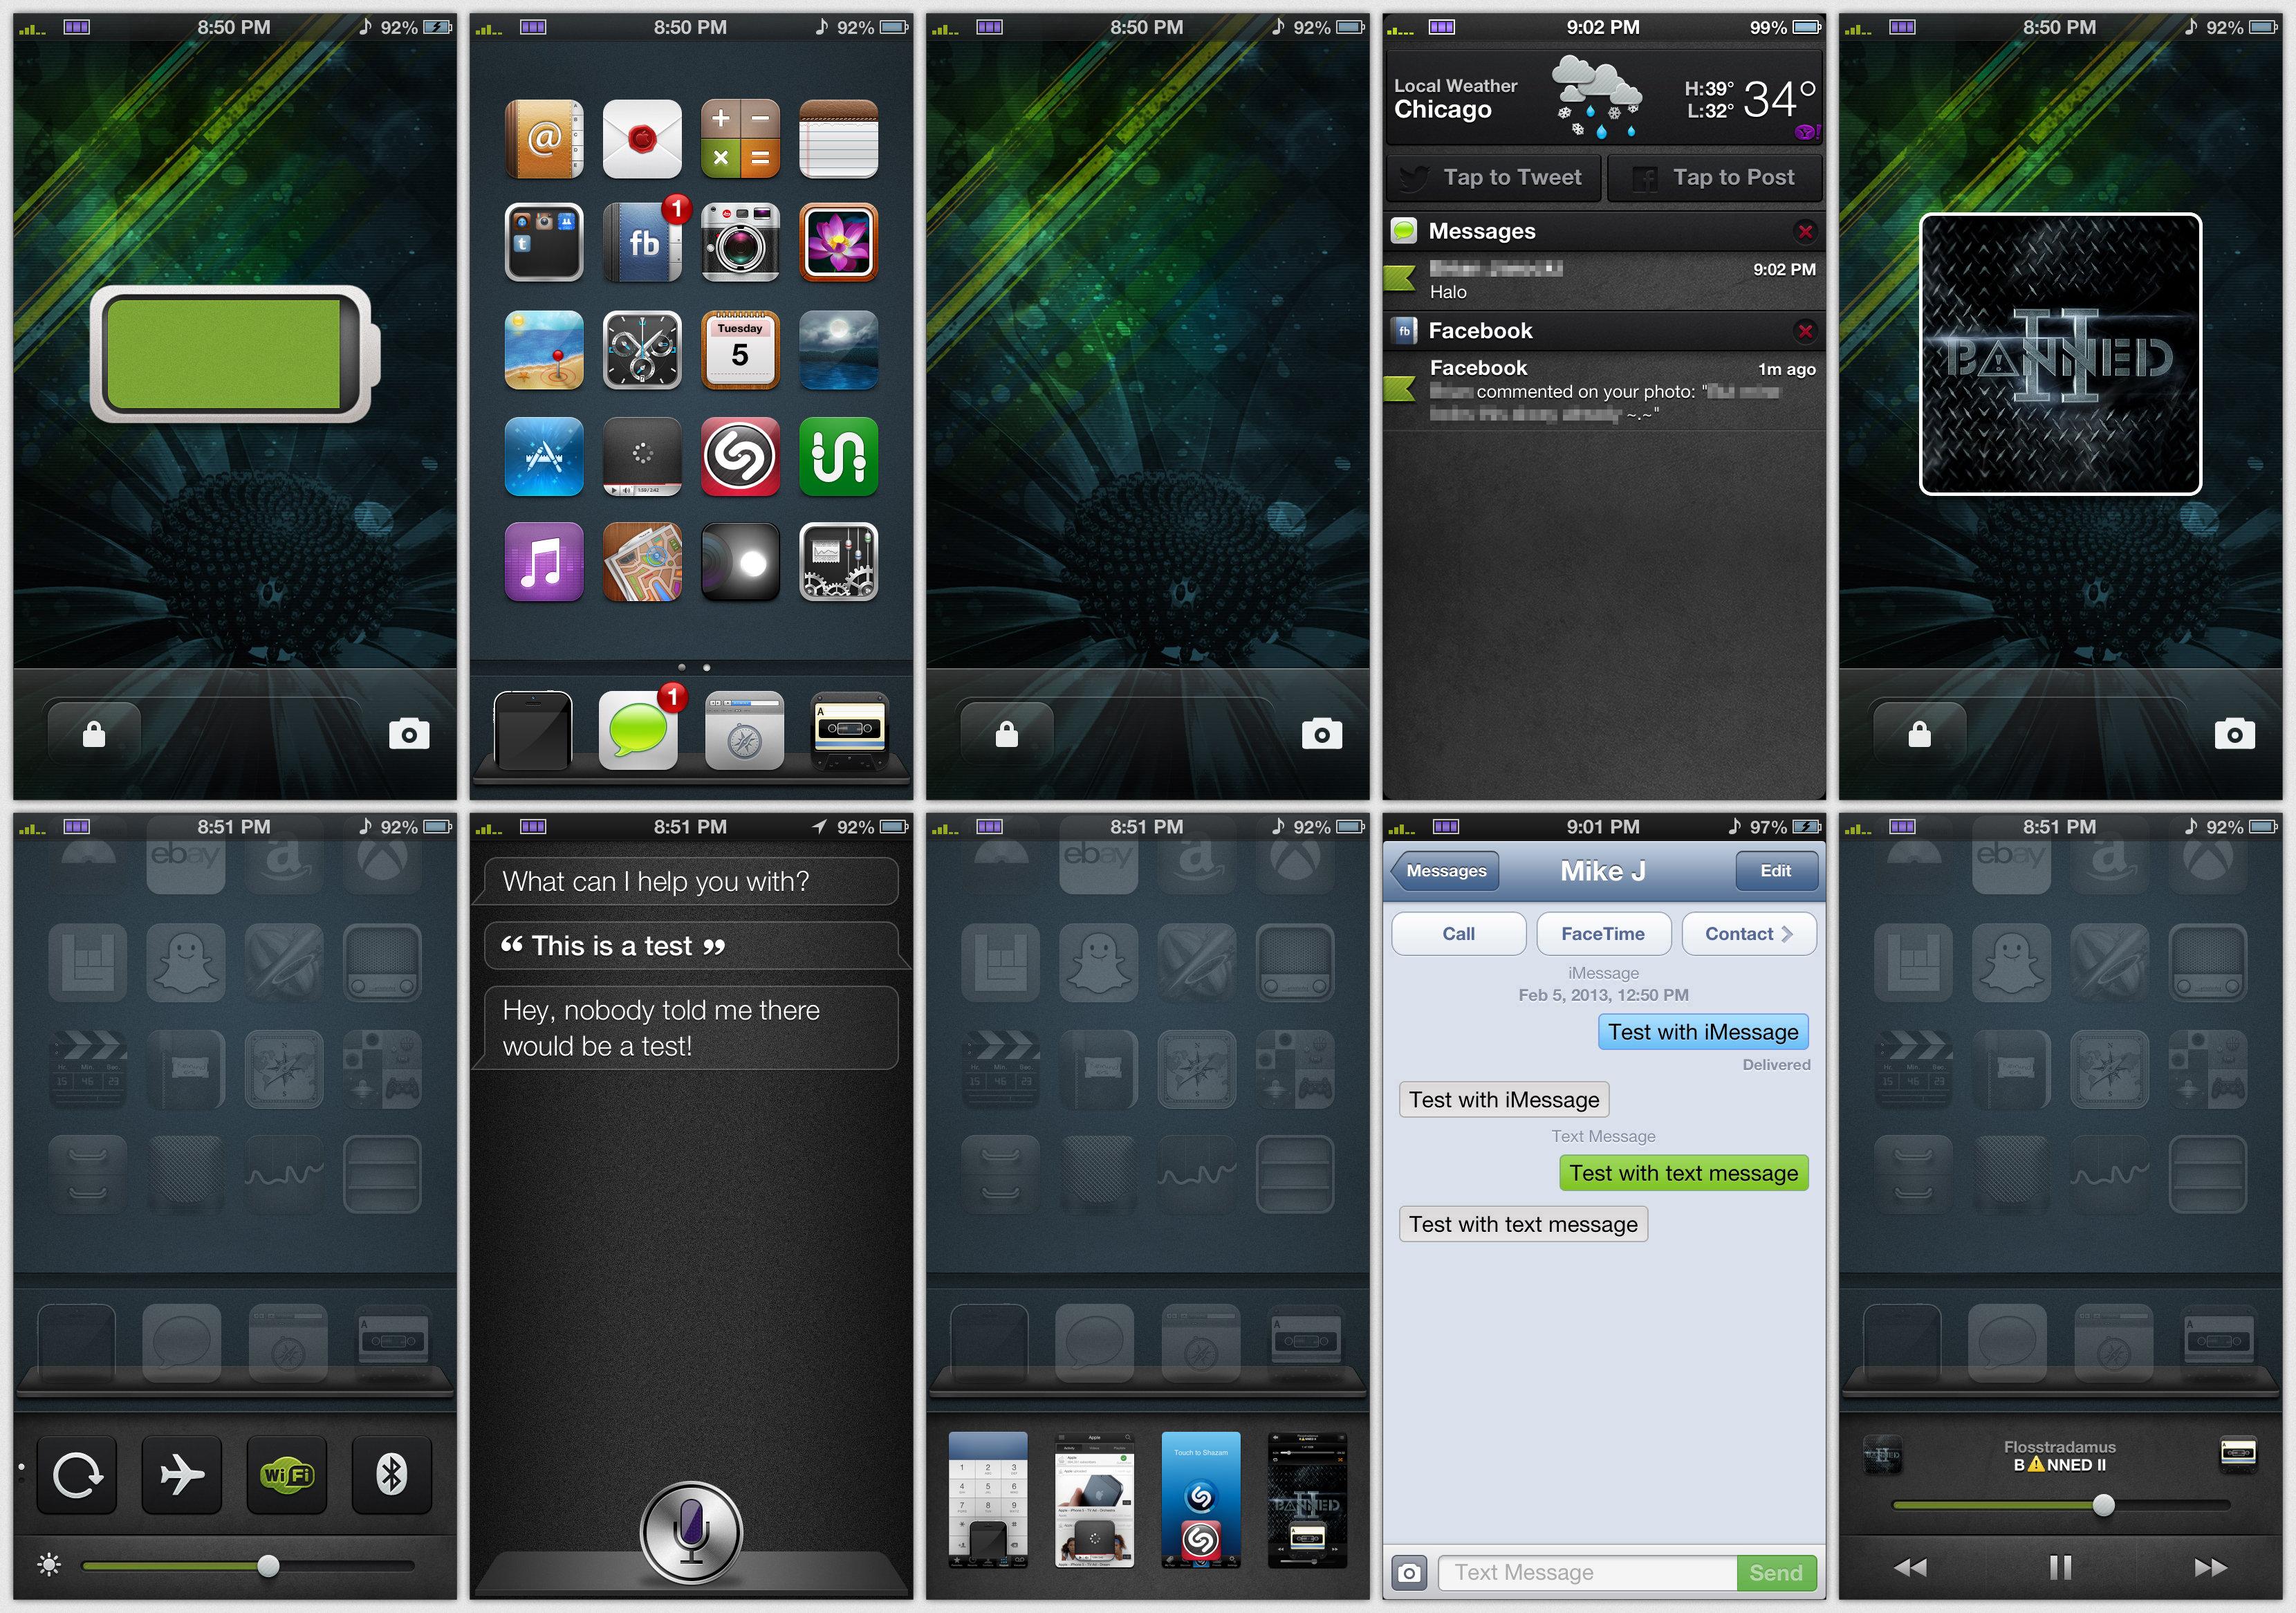 screenshot on iphone 5